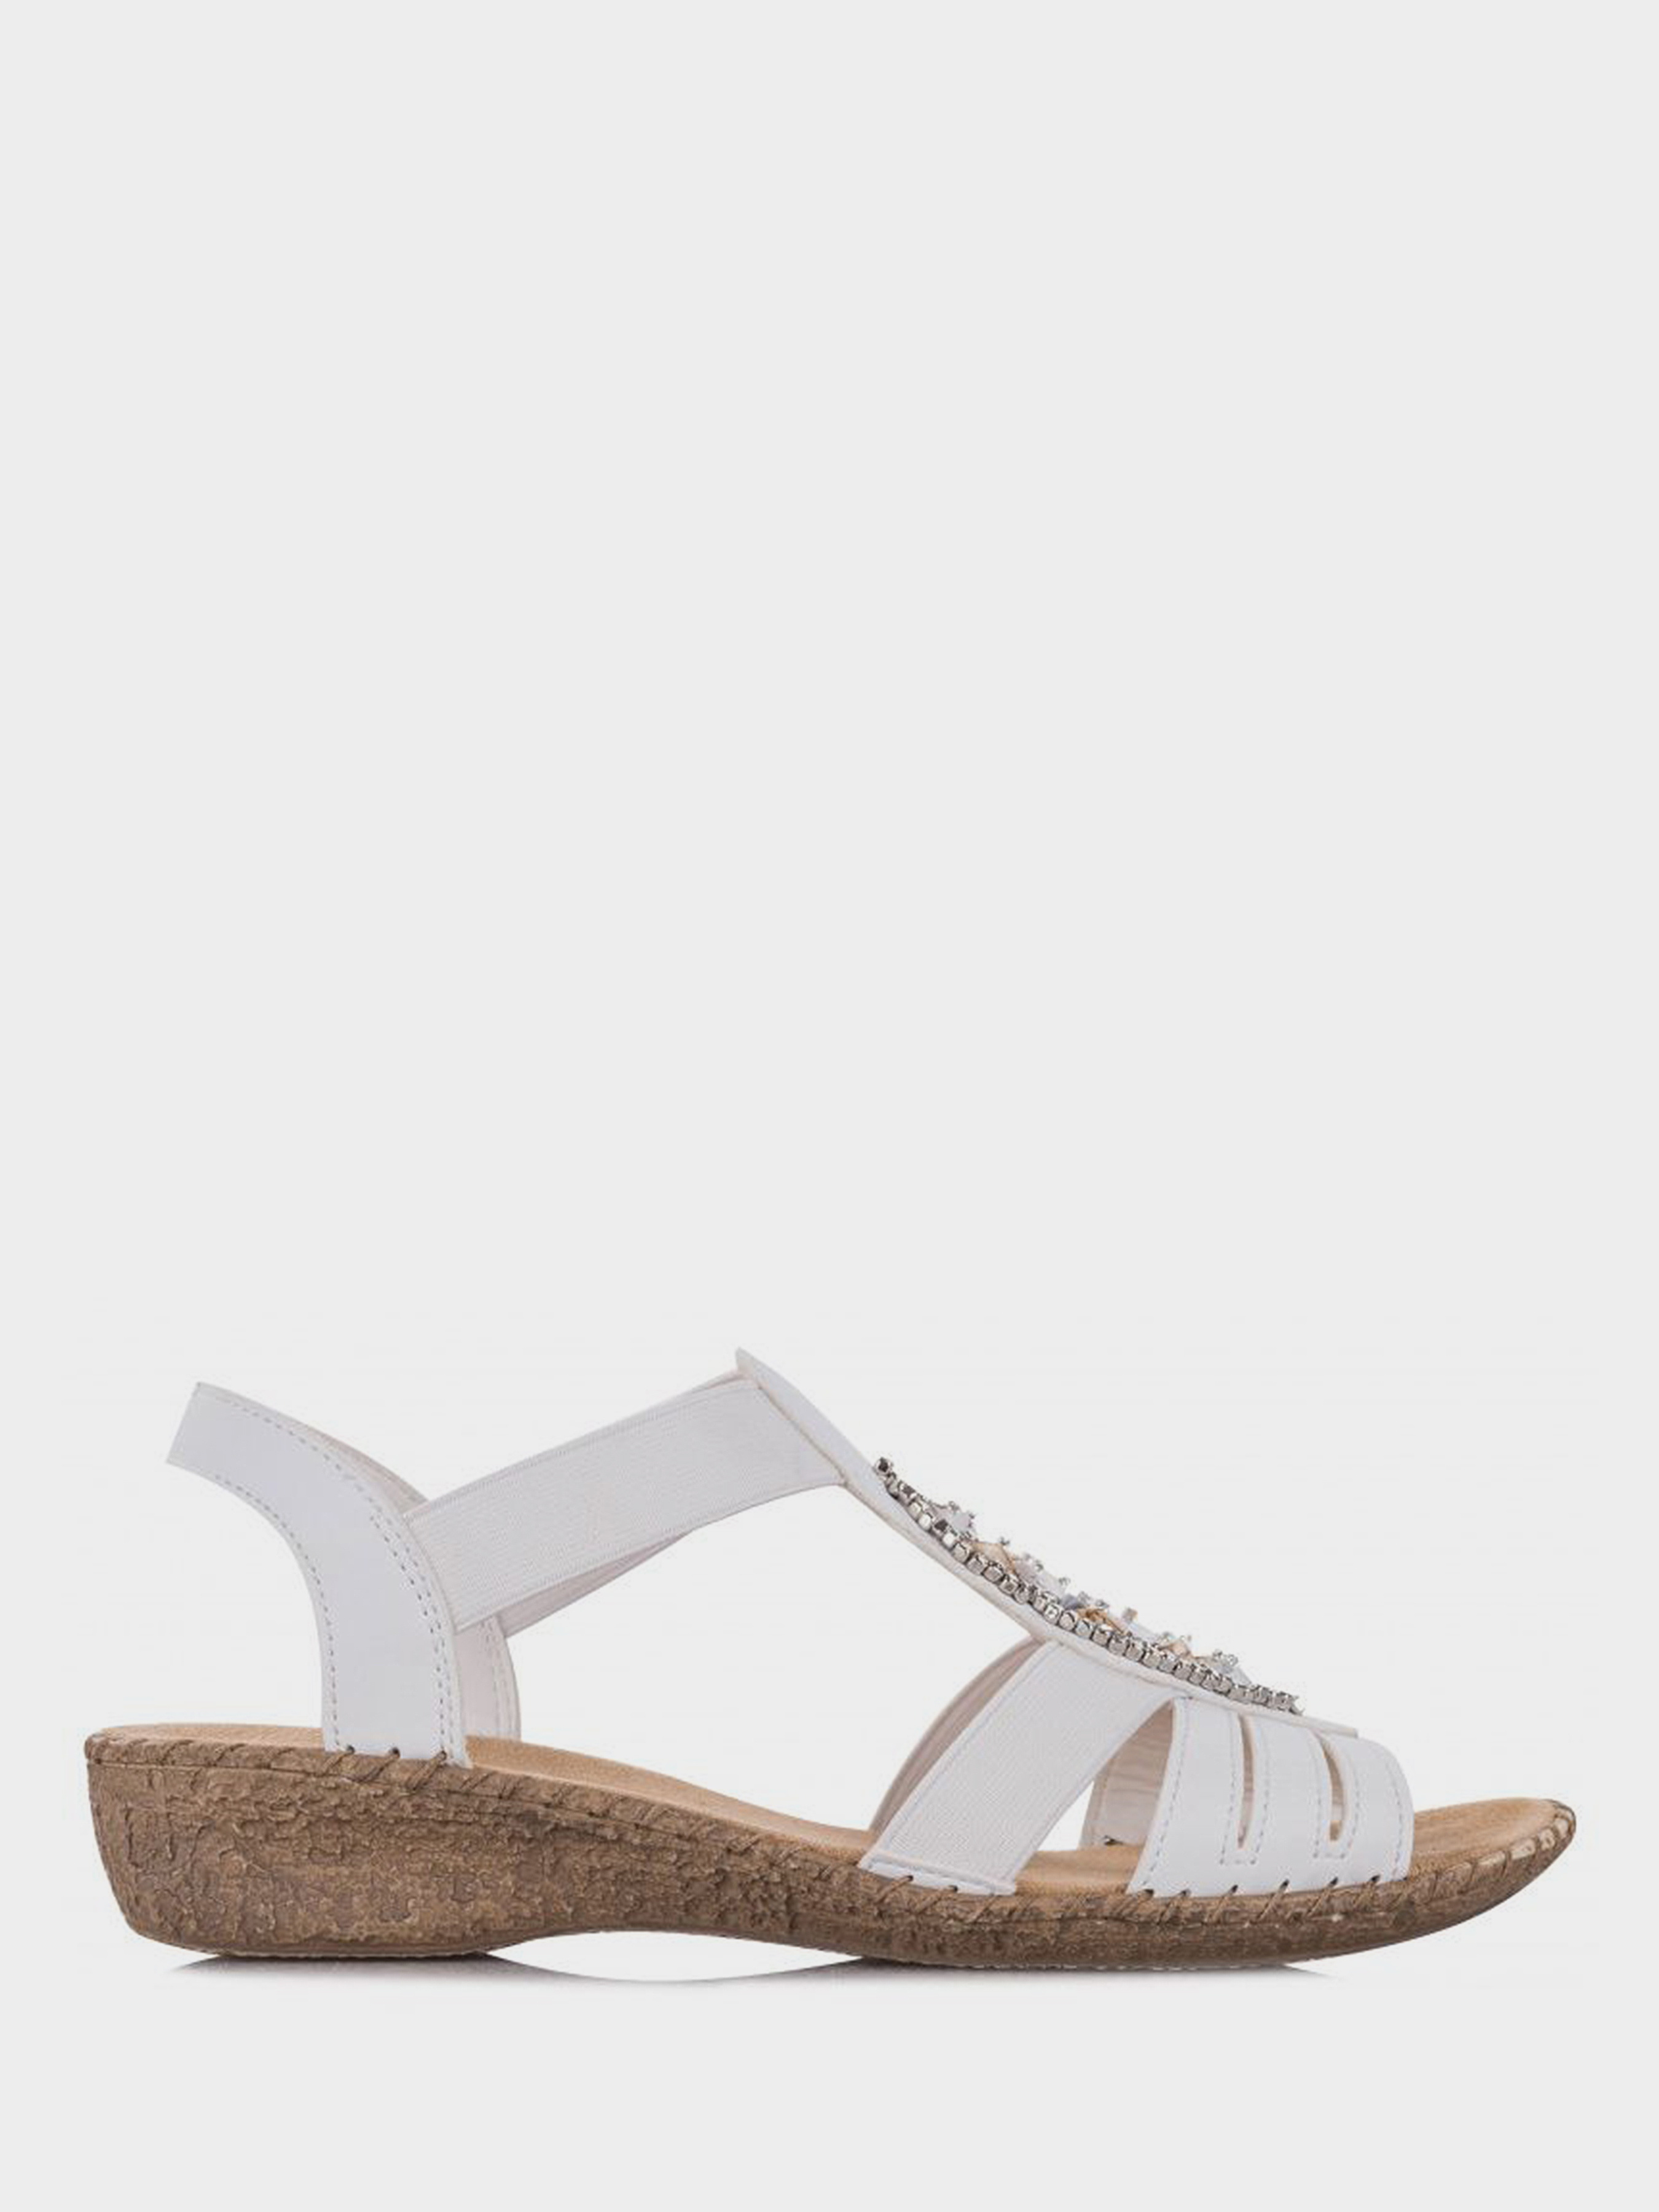 Сандалии для женщин RIEKER RW1193 размерная сетка обуви, 2017